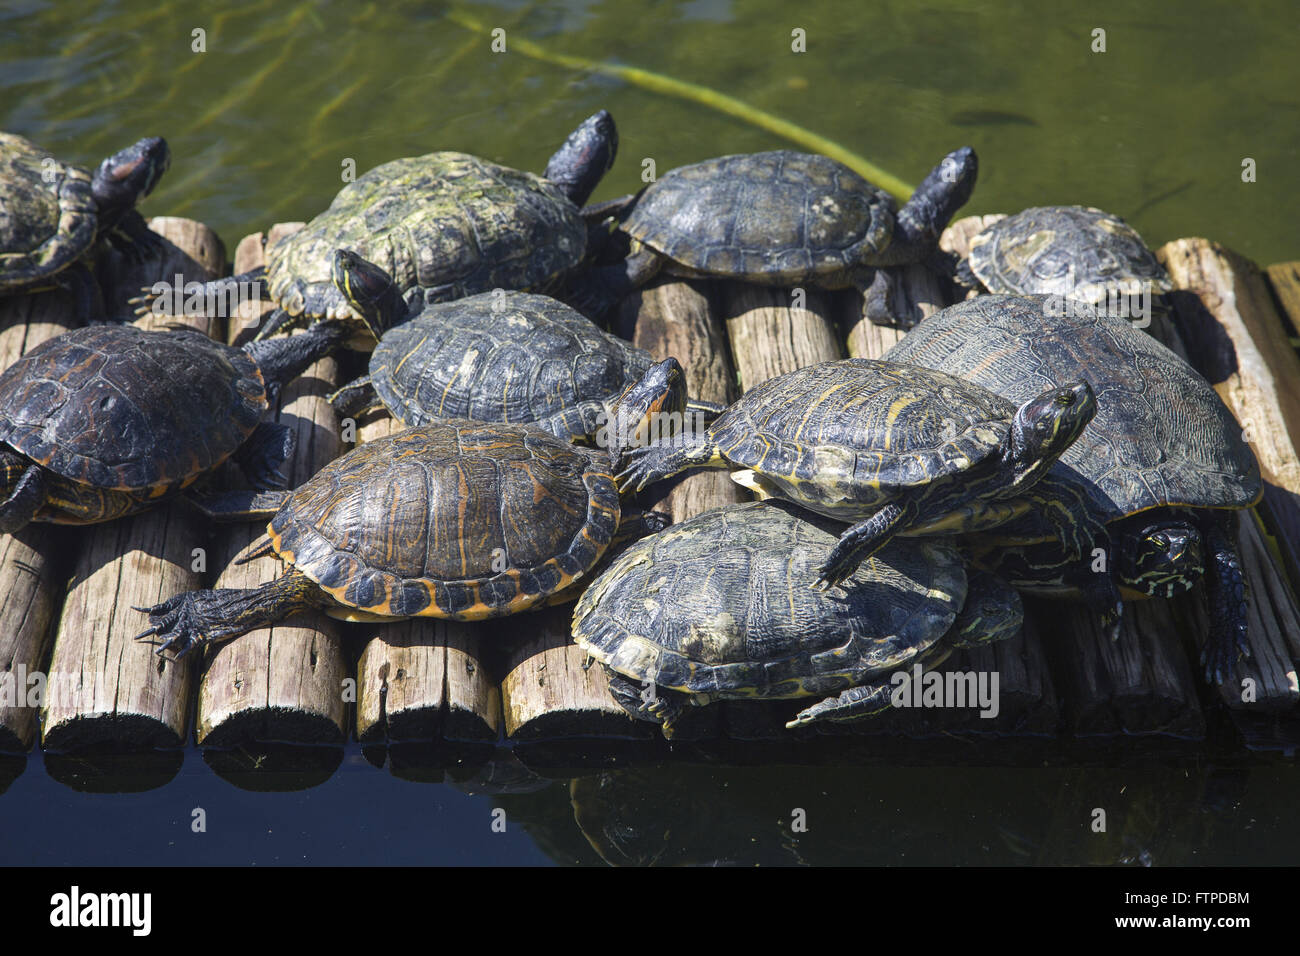 Turtles in Lake Botanical Garden of Rio de Janeiro - Stock Image